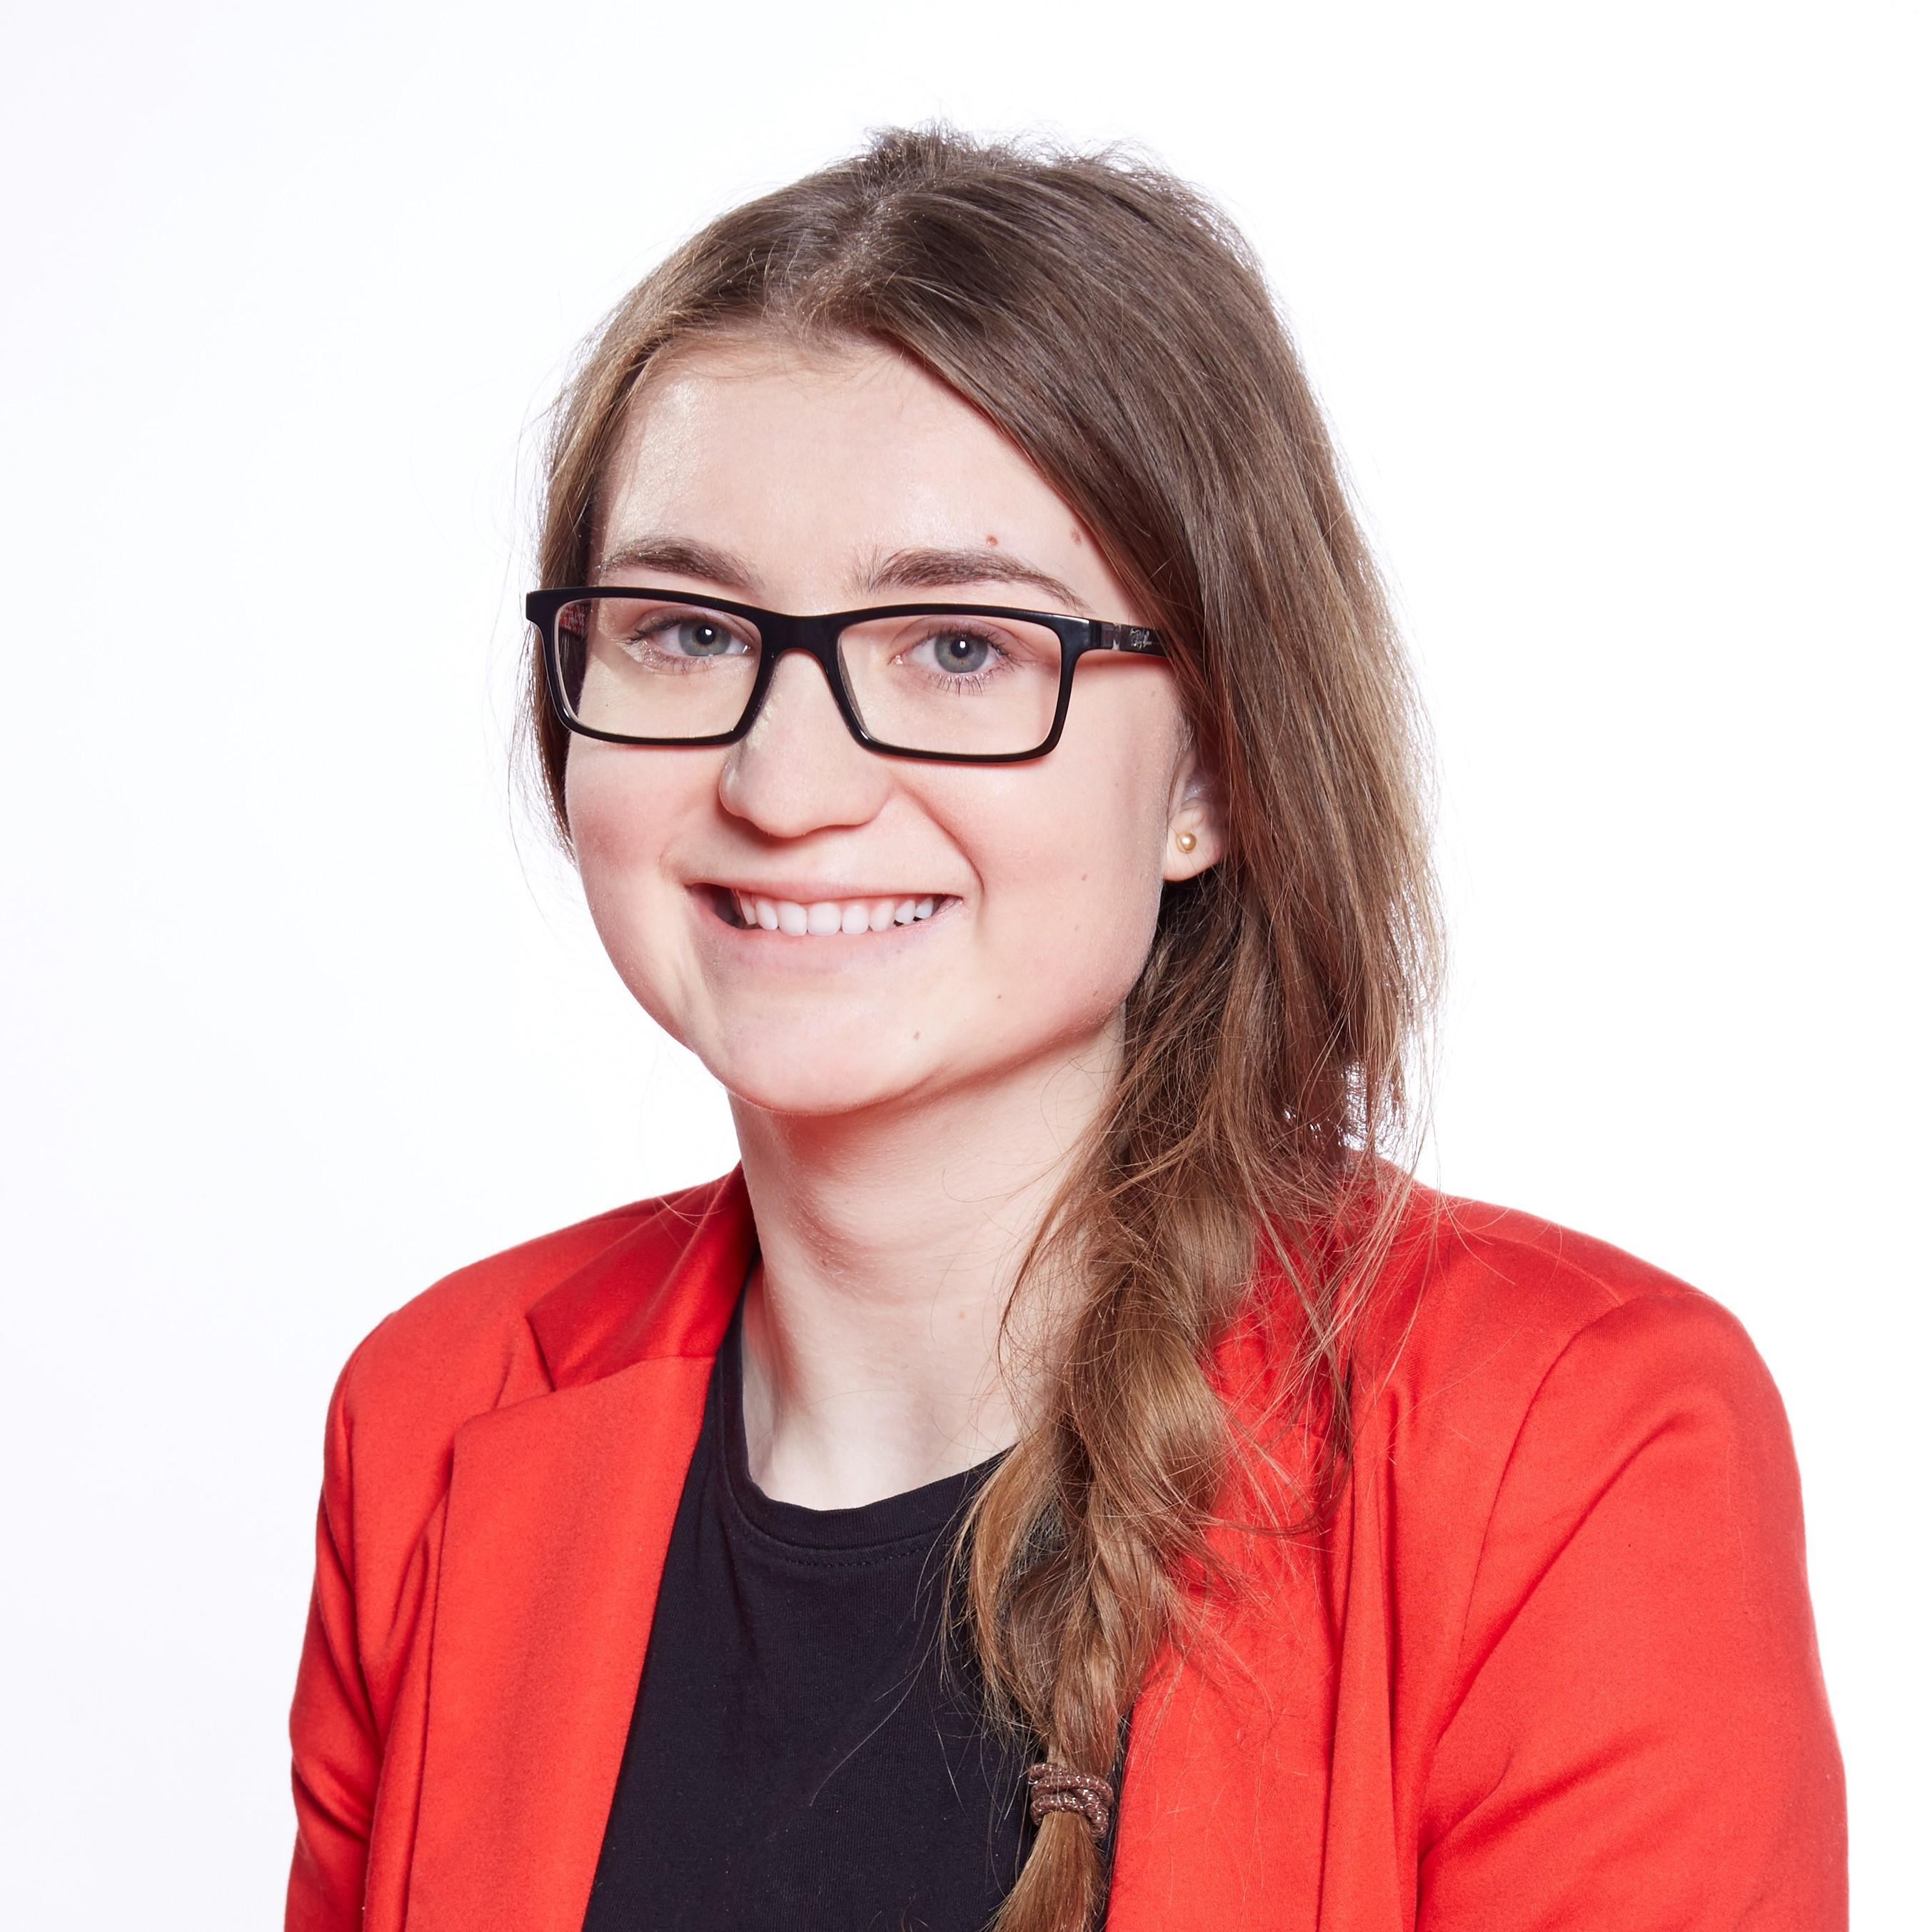 Hana Travnickova, Marketing Specialist